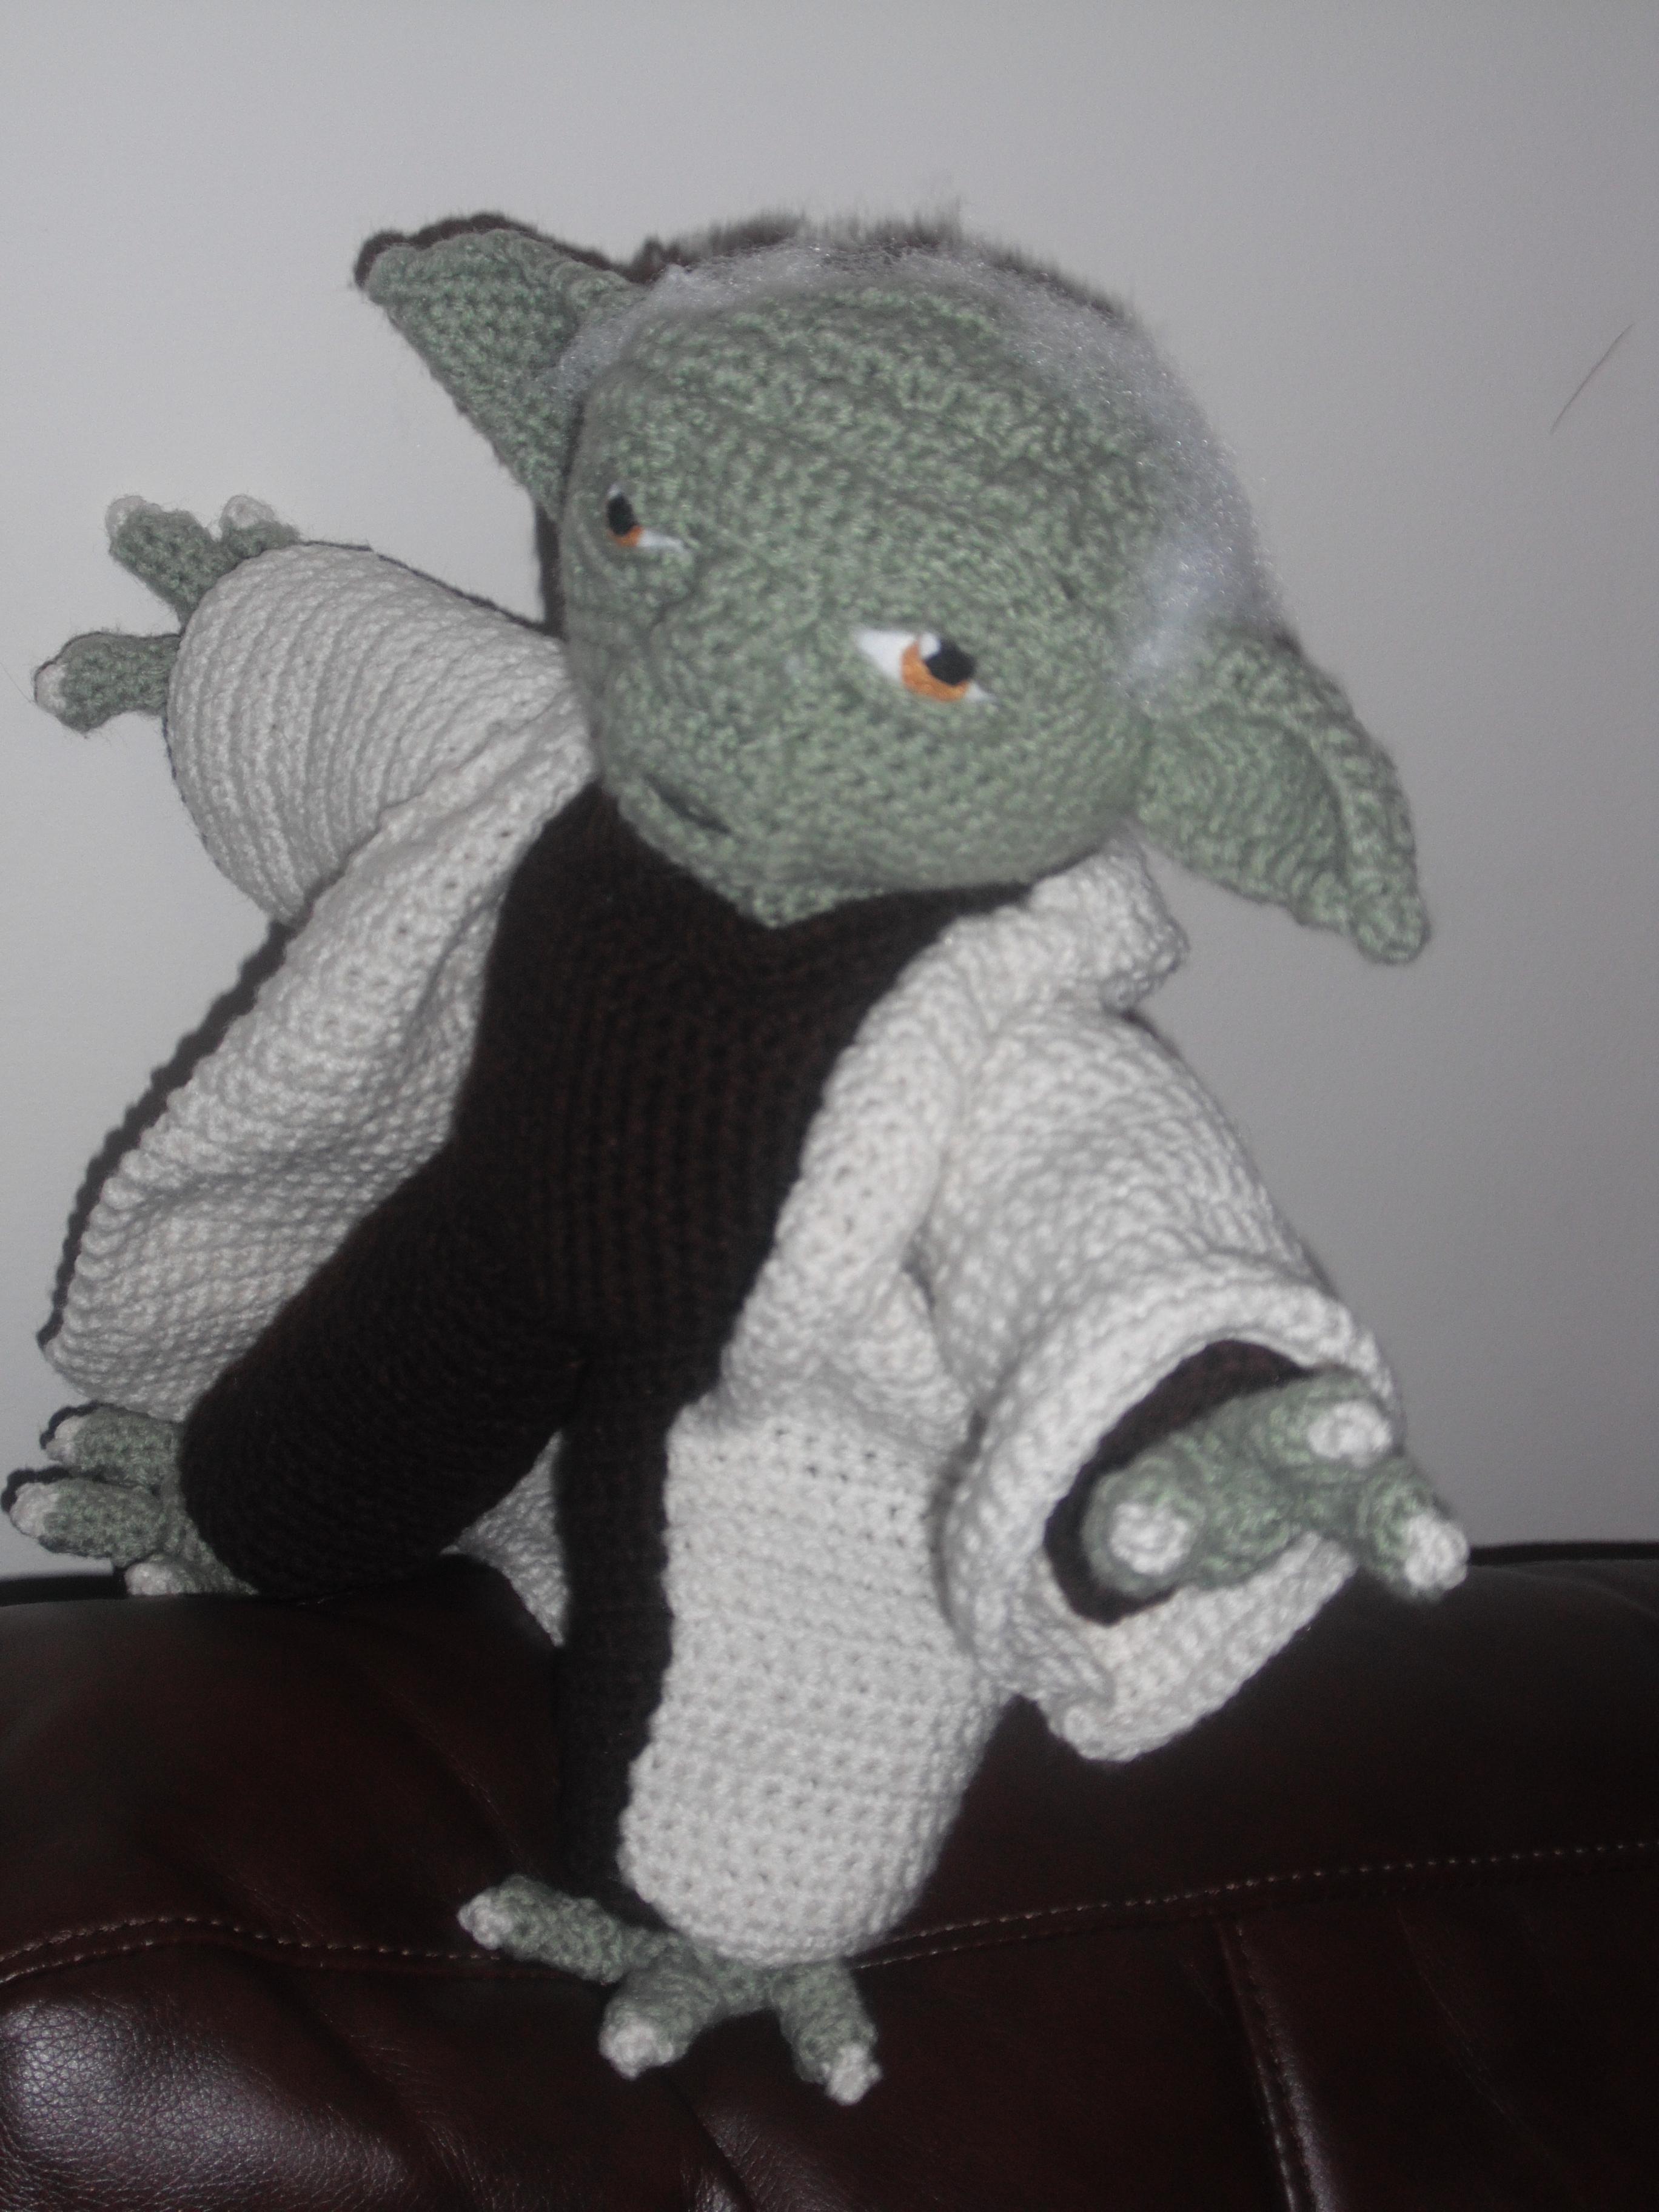 Amigurumi maestro Yoda free pattern schemi gratis amigurumi amigurumi free dowload